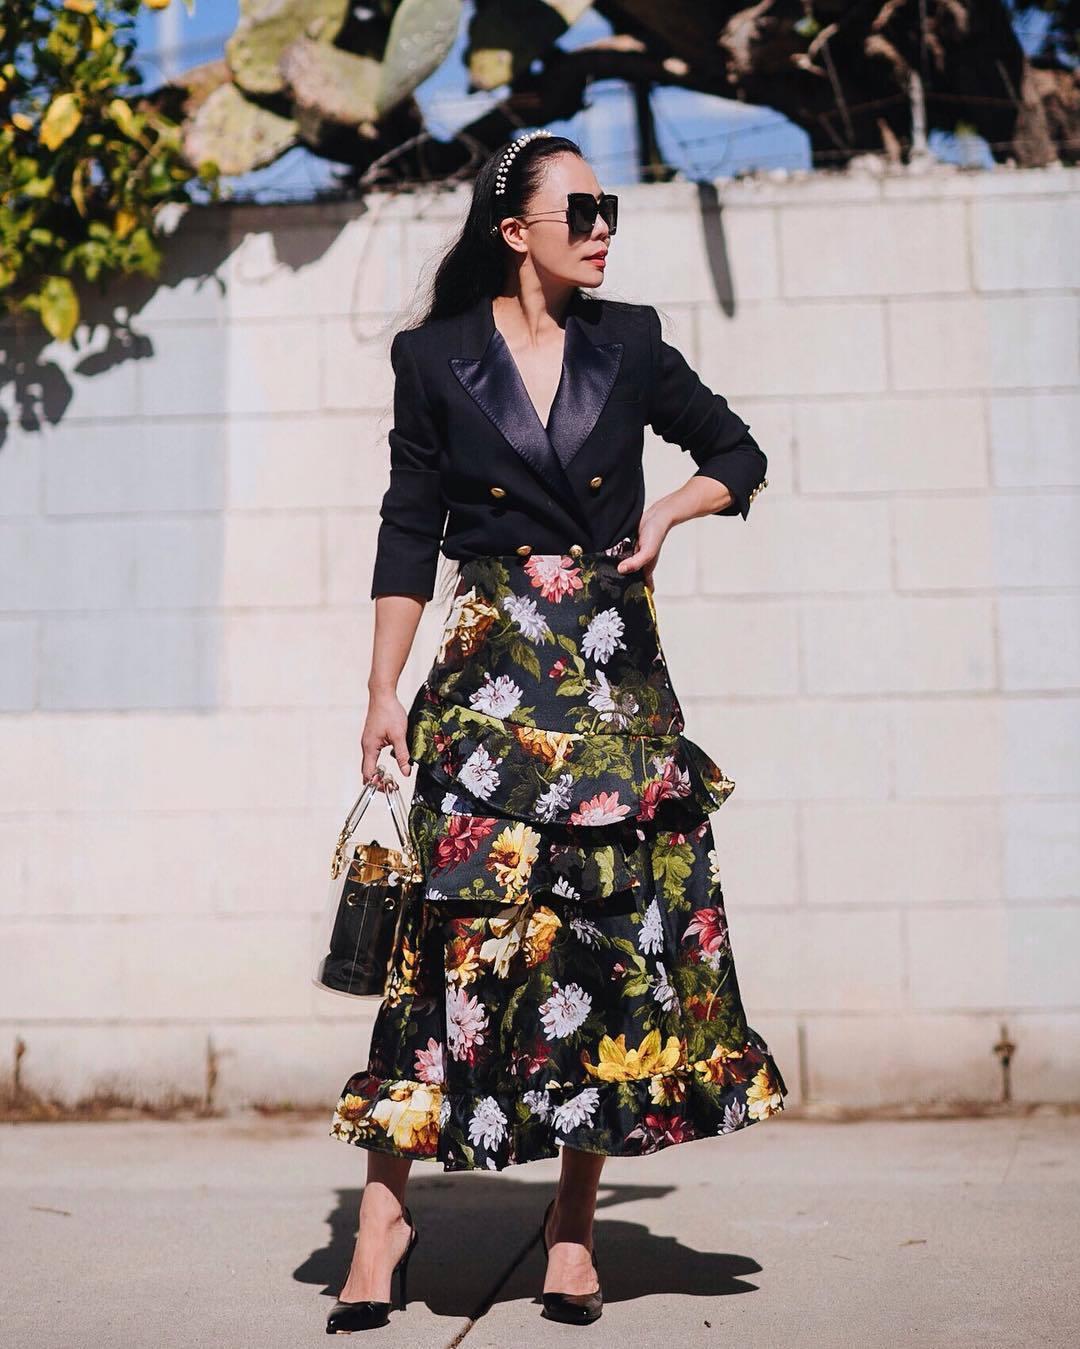 skirt floral skirt maxi skirt ruffle black skirt high waisted skirt pumps black bag black blazer